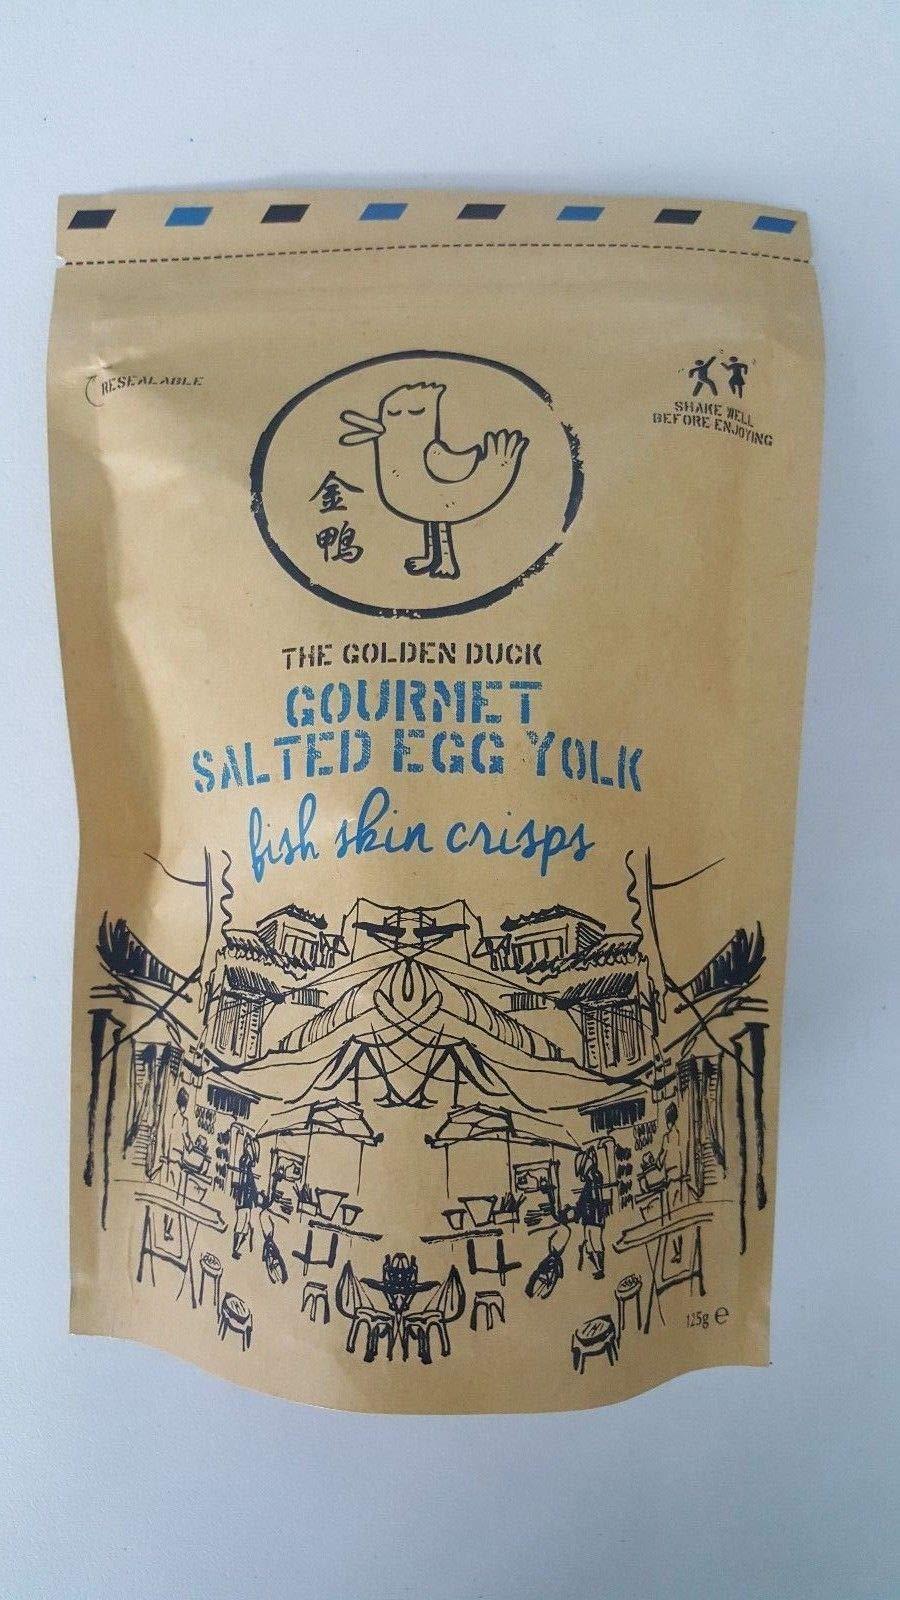 Amazoncom Irvins Salted Egg Fish Skin Crisps 105g